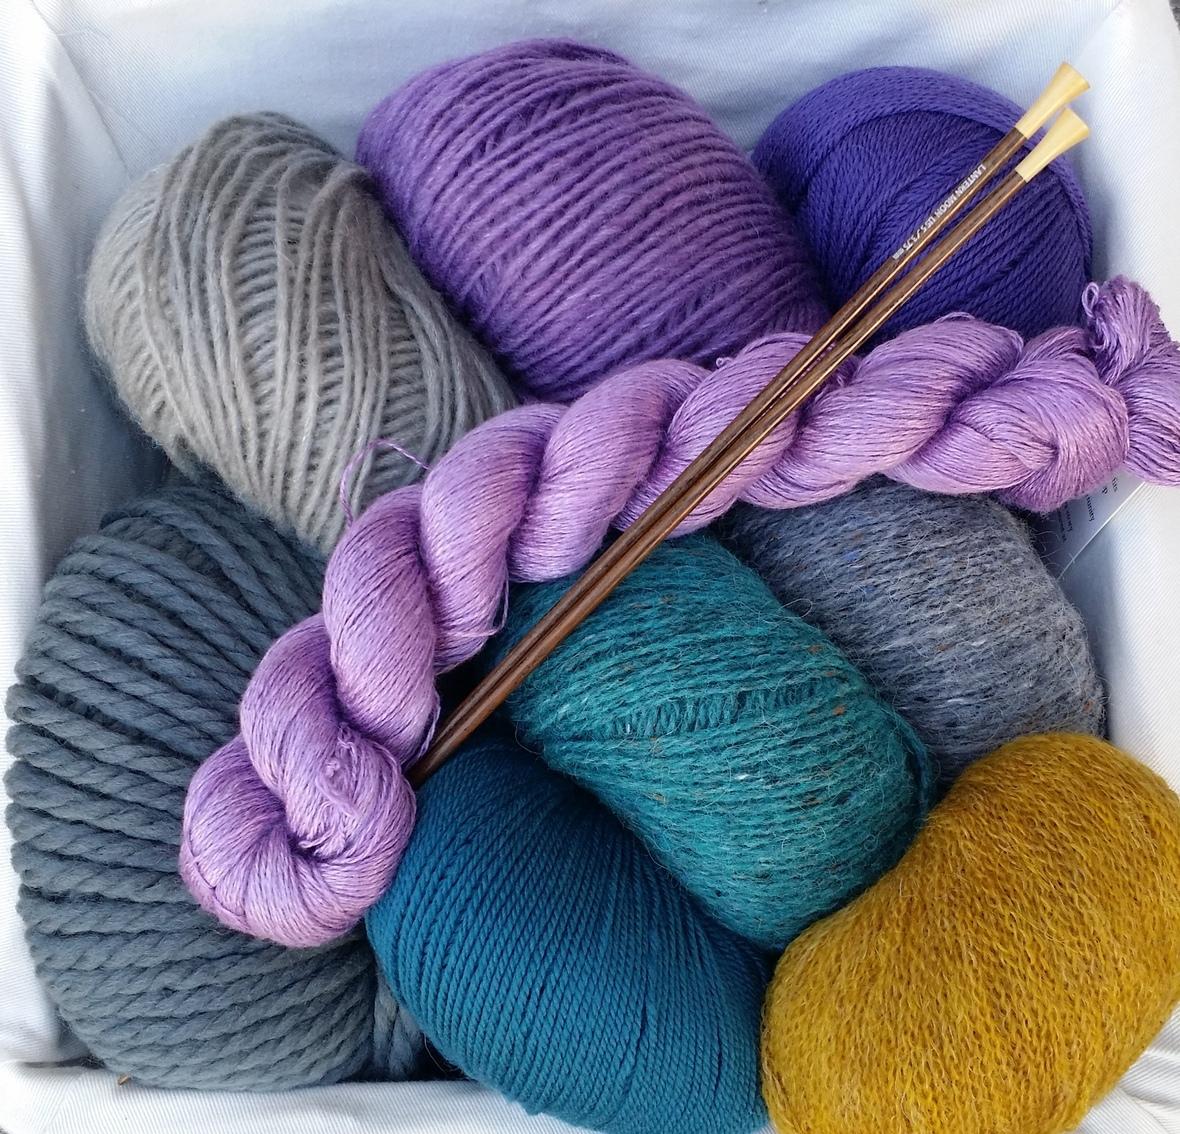 New yarn tasting 1